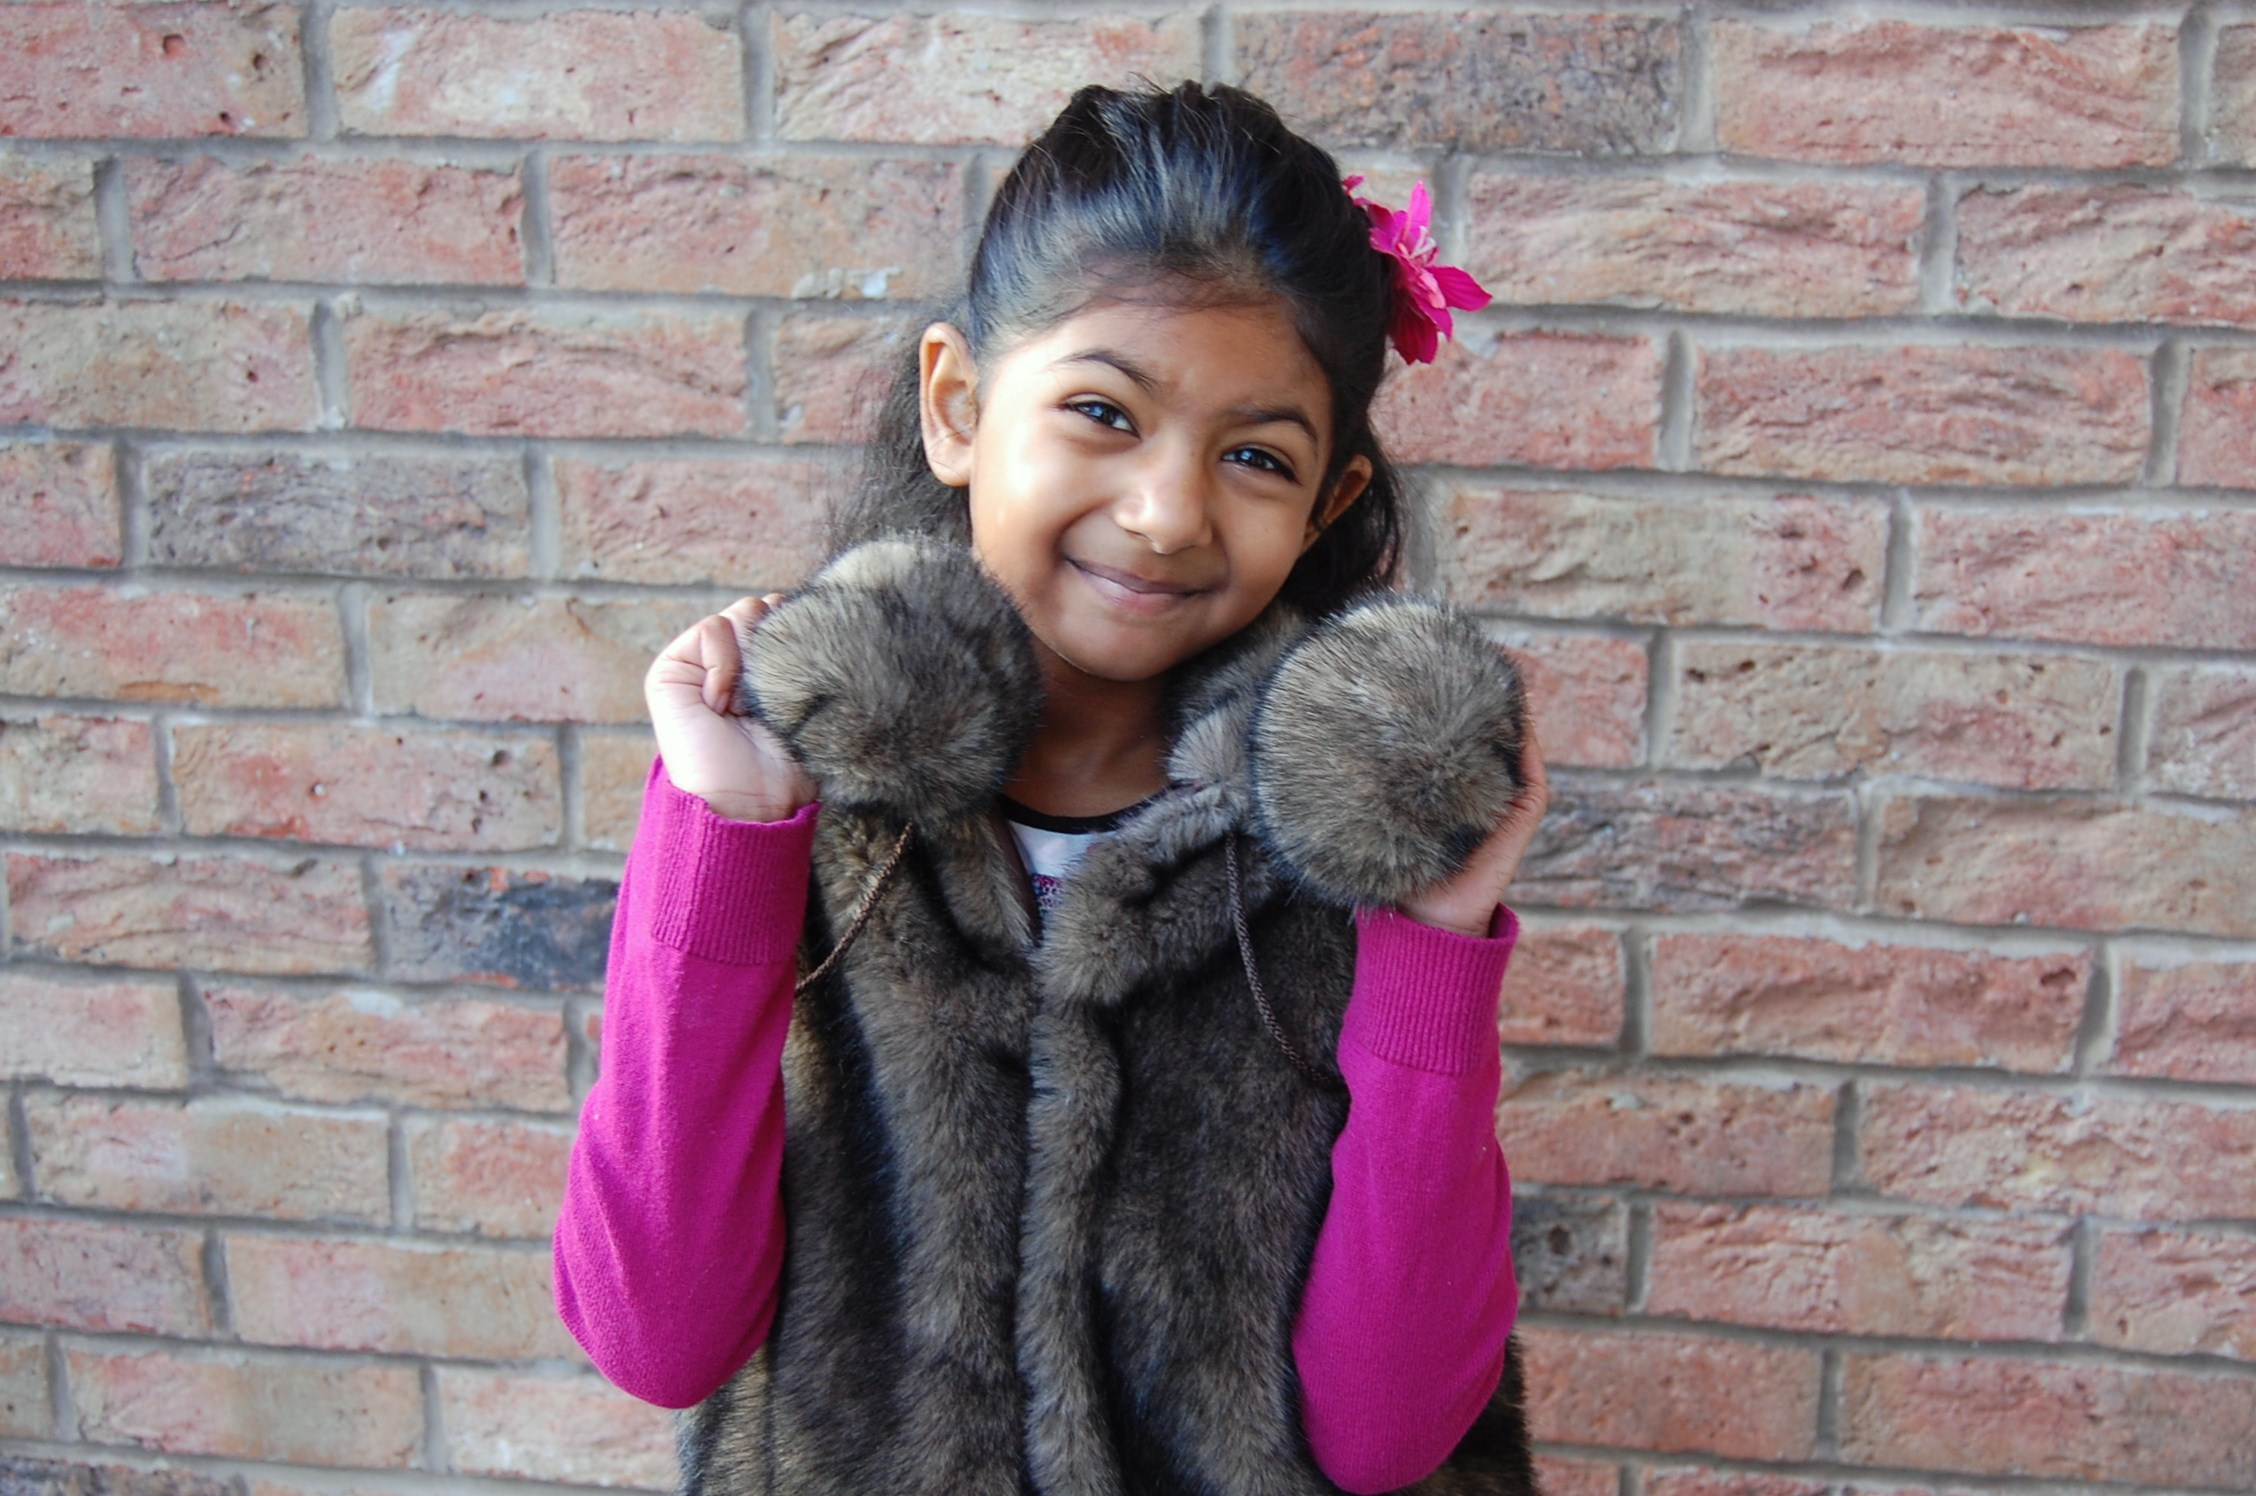 303a0ea5af37 Children s clothing – sewmanju